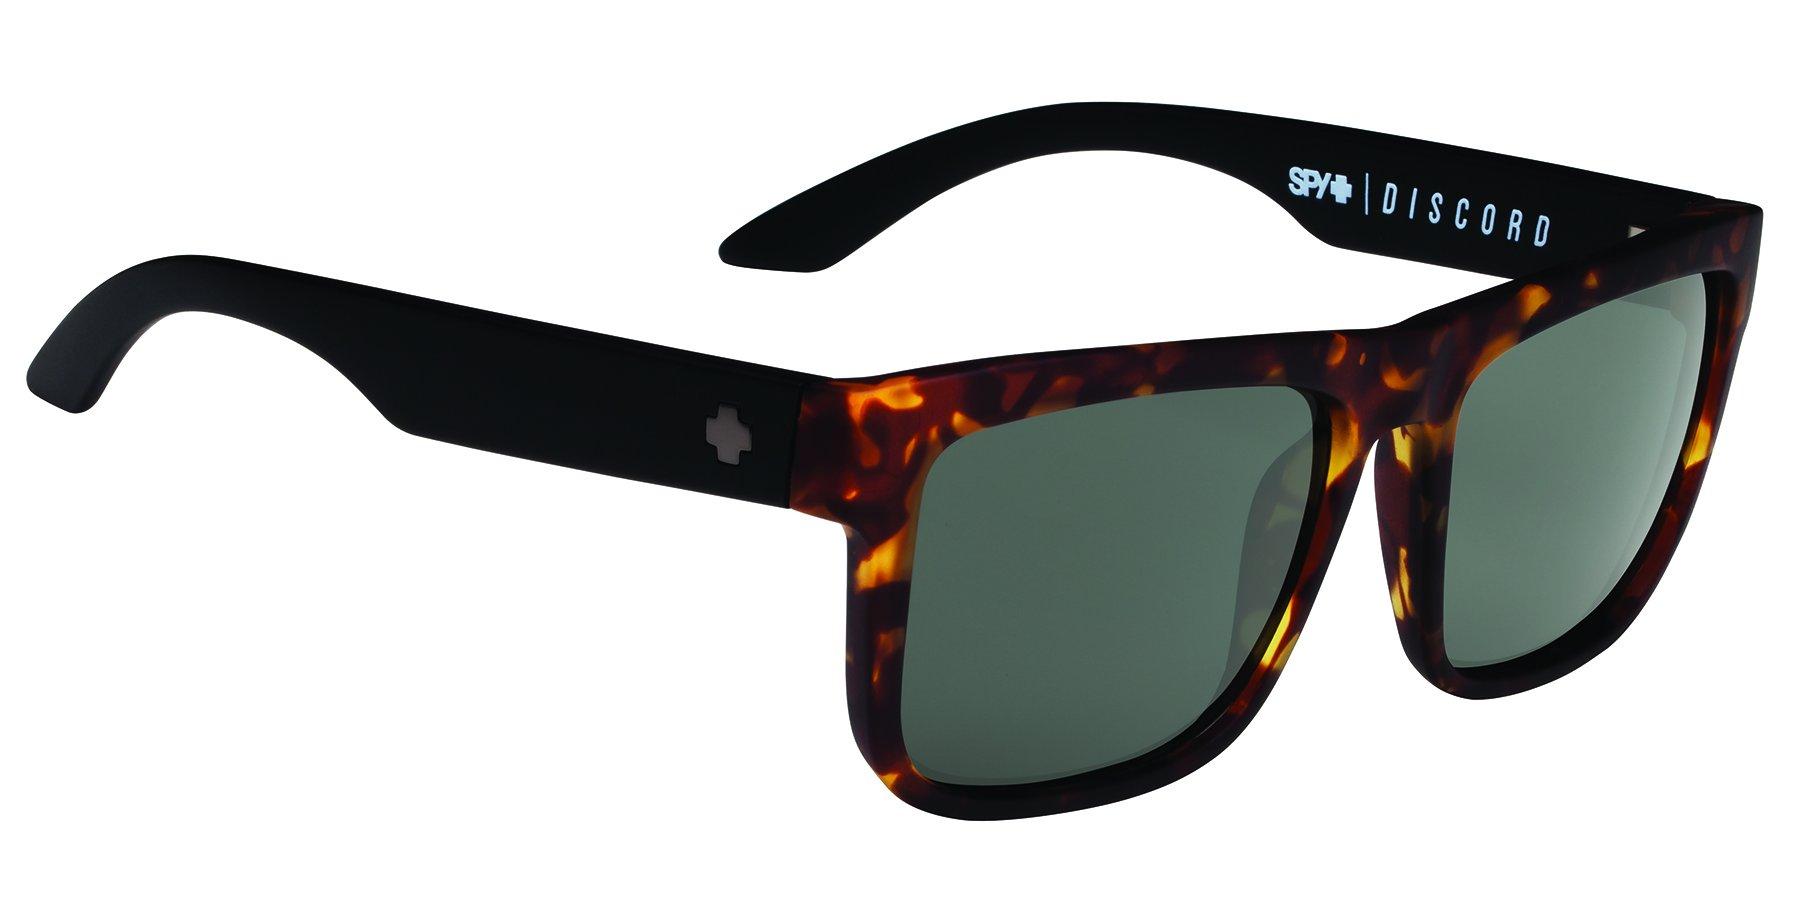 Spy Optic Discord Flat Sunglasses, Vintage Tort/Happy Gray/Green, 57 mm